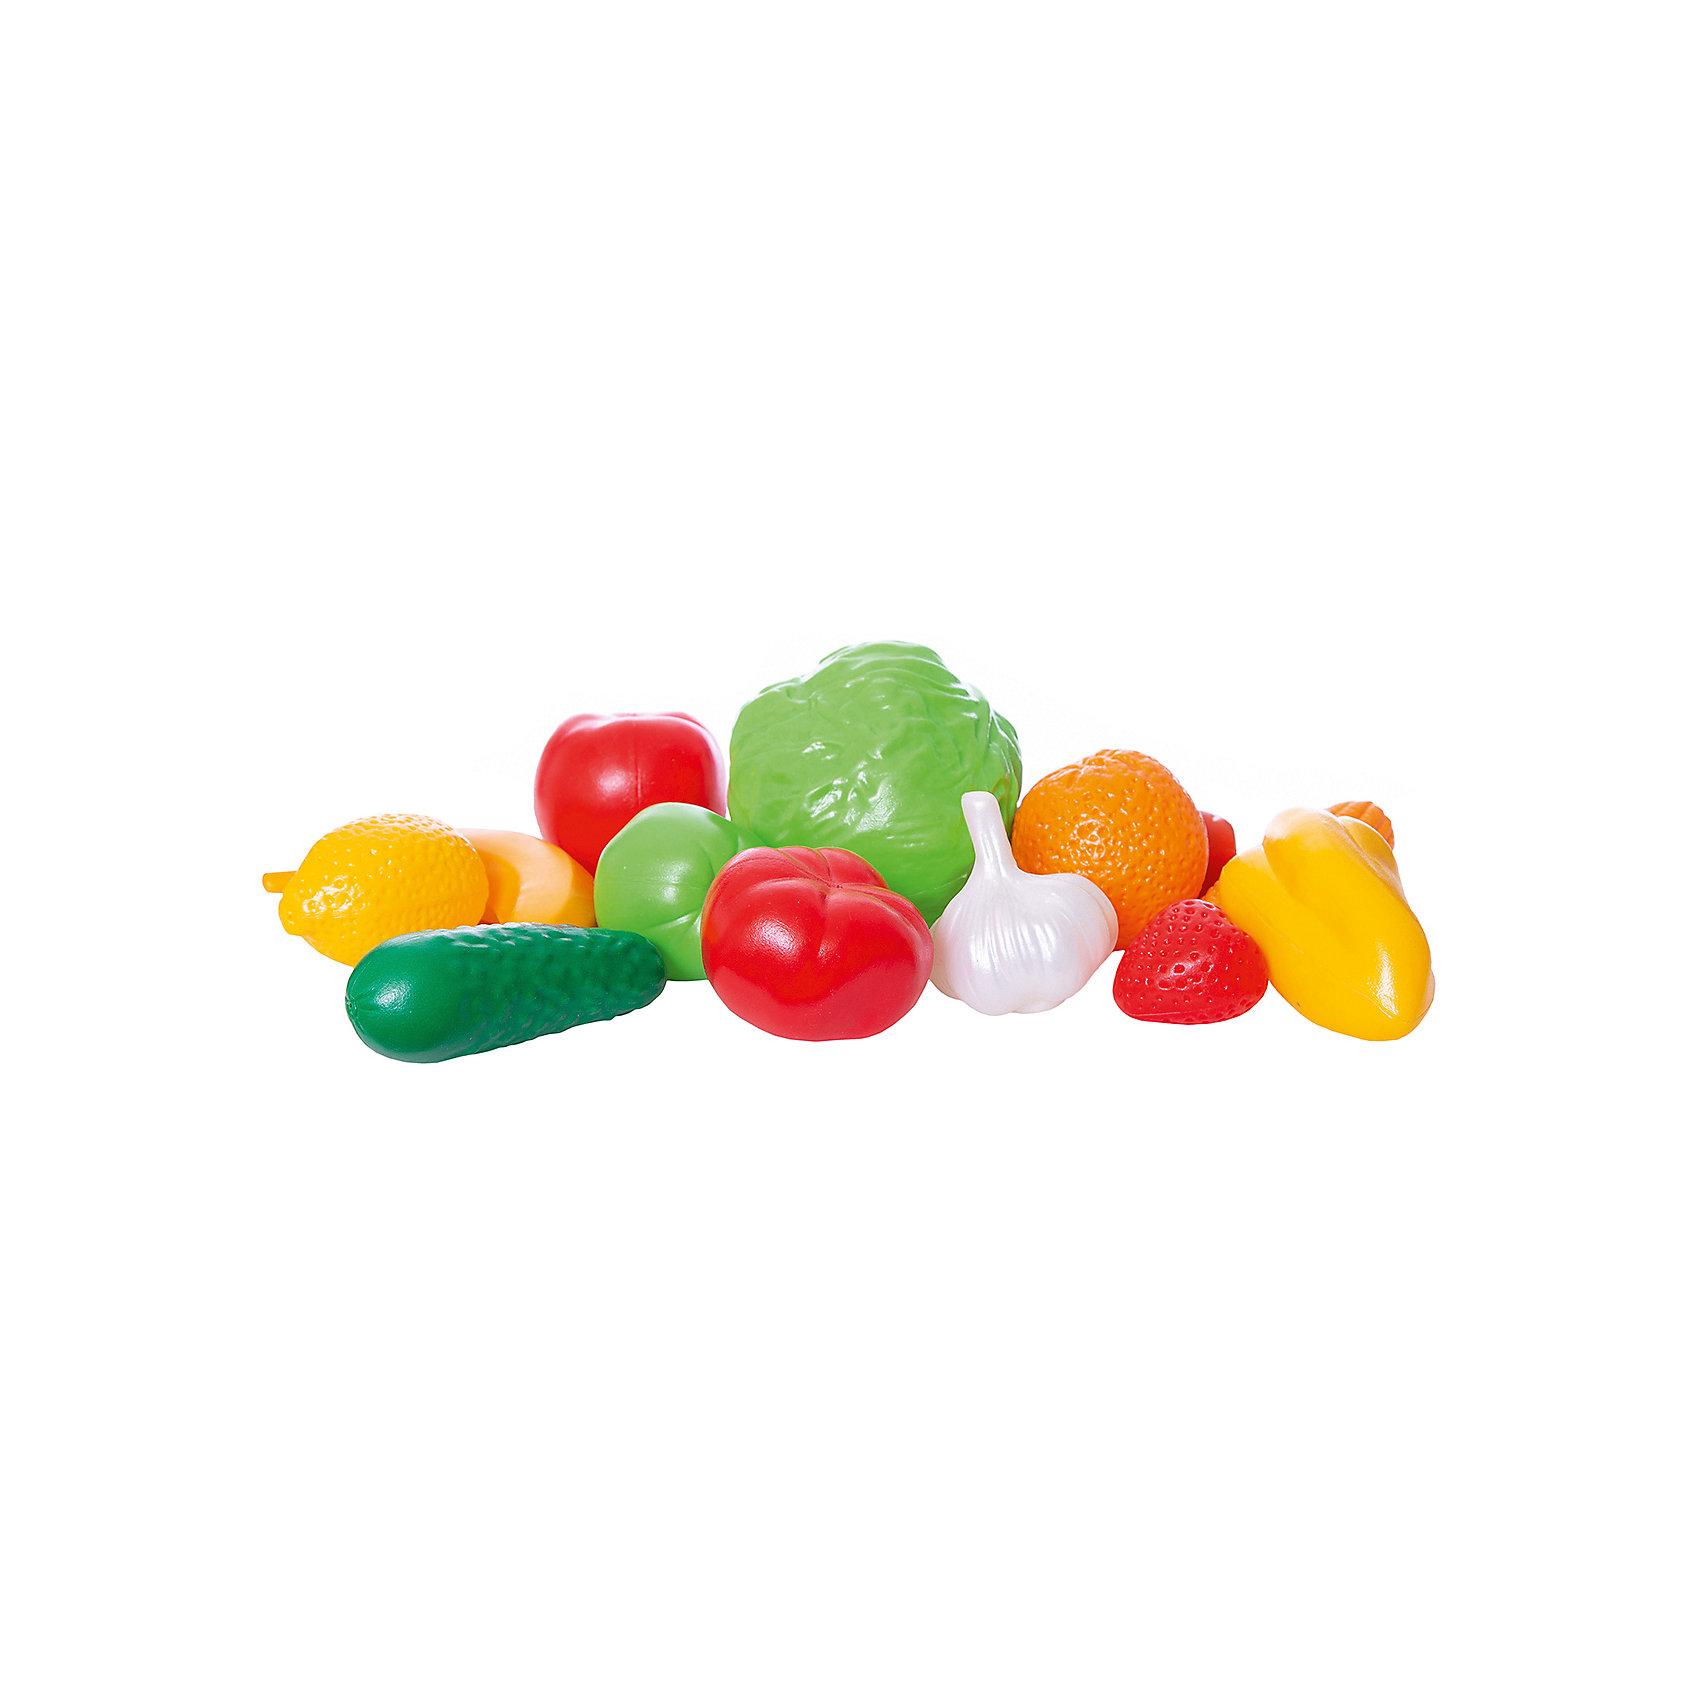 Нордпласт Набор Фрукты, Овощи, Нордпласт игнатова а овощи и фрукты